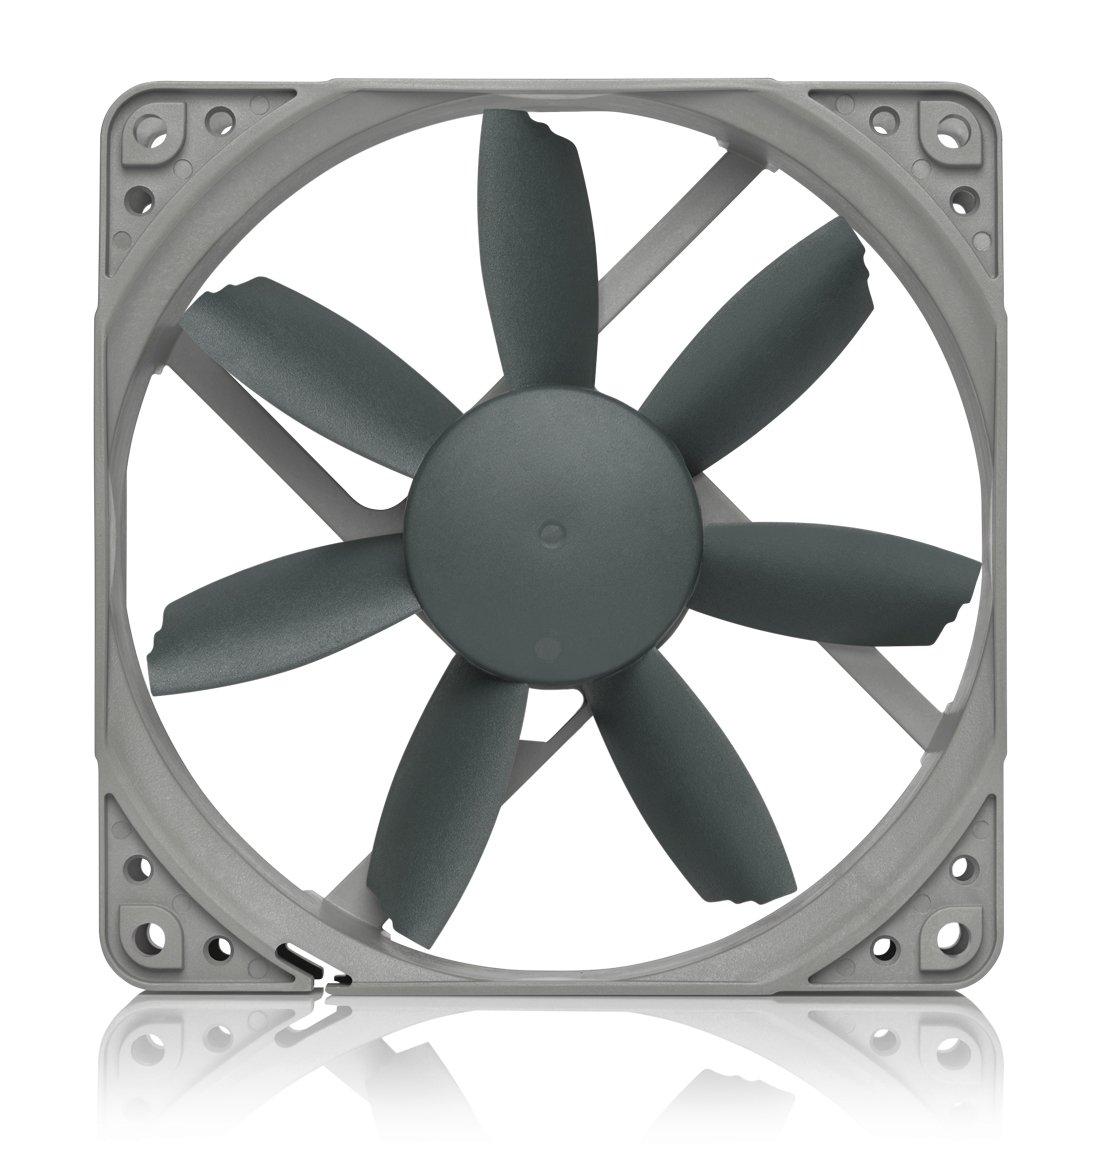 Noctua SSO Bearing Fan Retail Cooling NF-S12B redux-1200 PWM by noctua (Image #2)